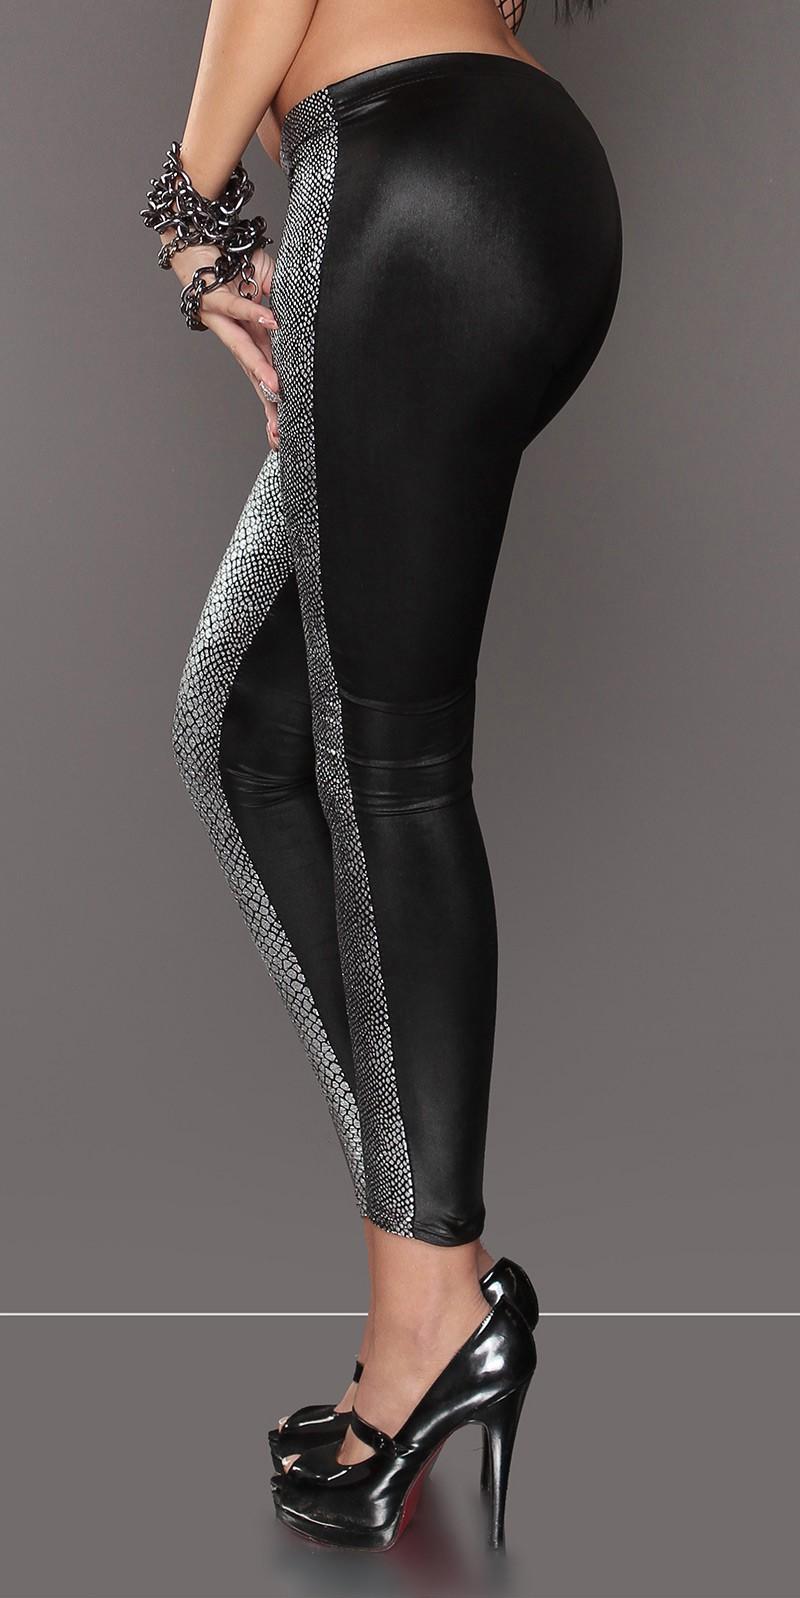 Stitching leggings